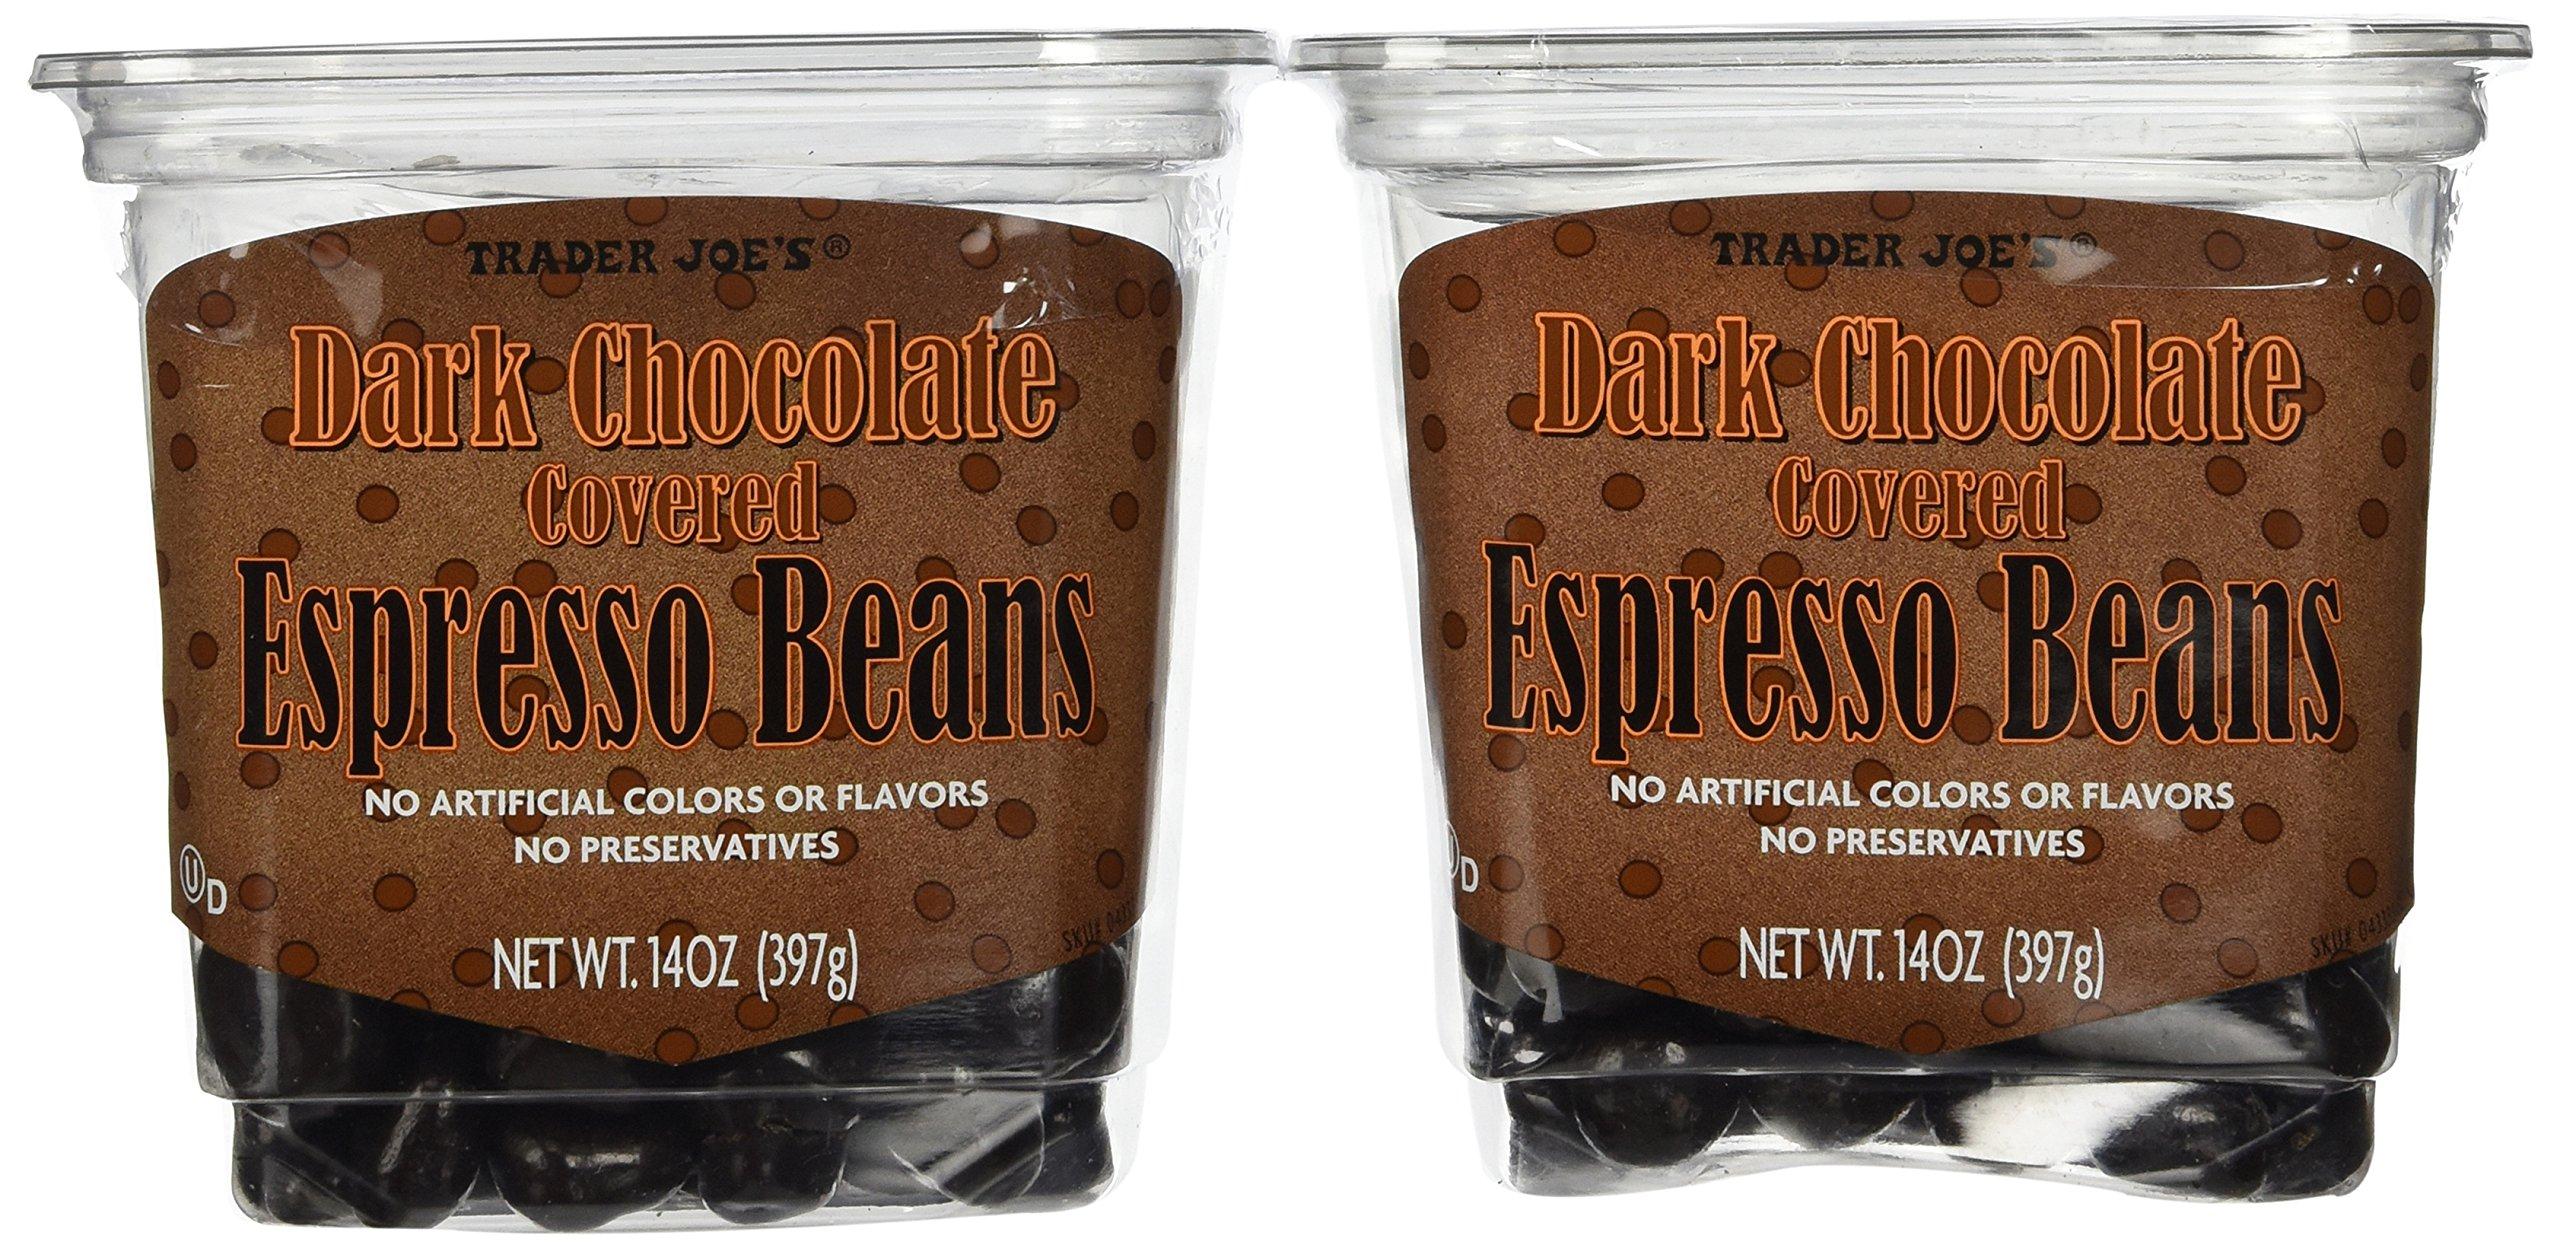 Trader Joe's Dark Chocolate Covered Espresso Beans, 14oz. (2 pack)